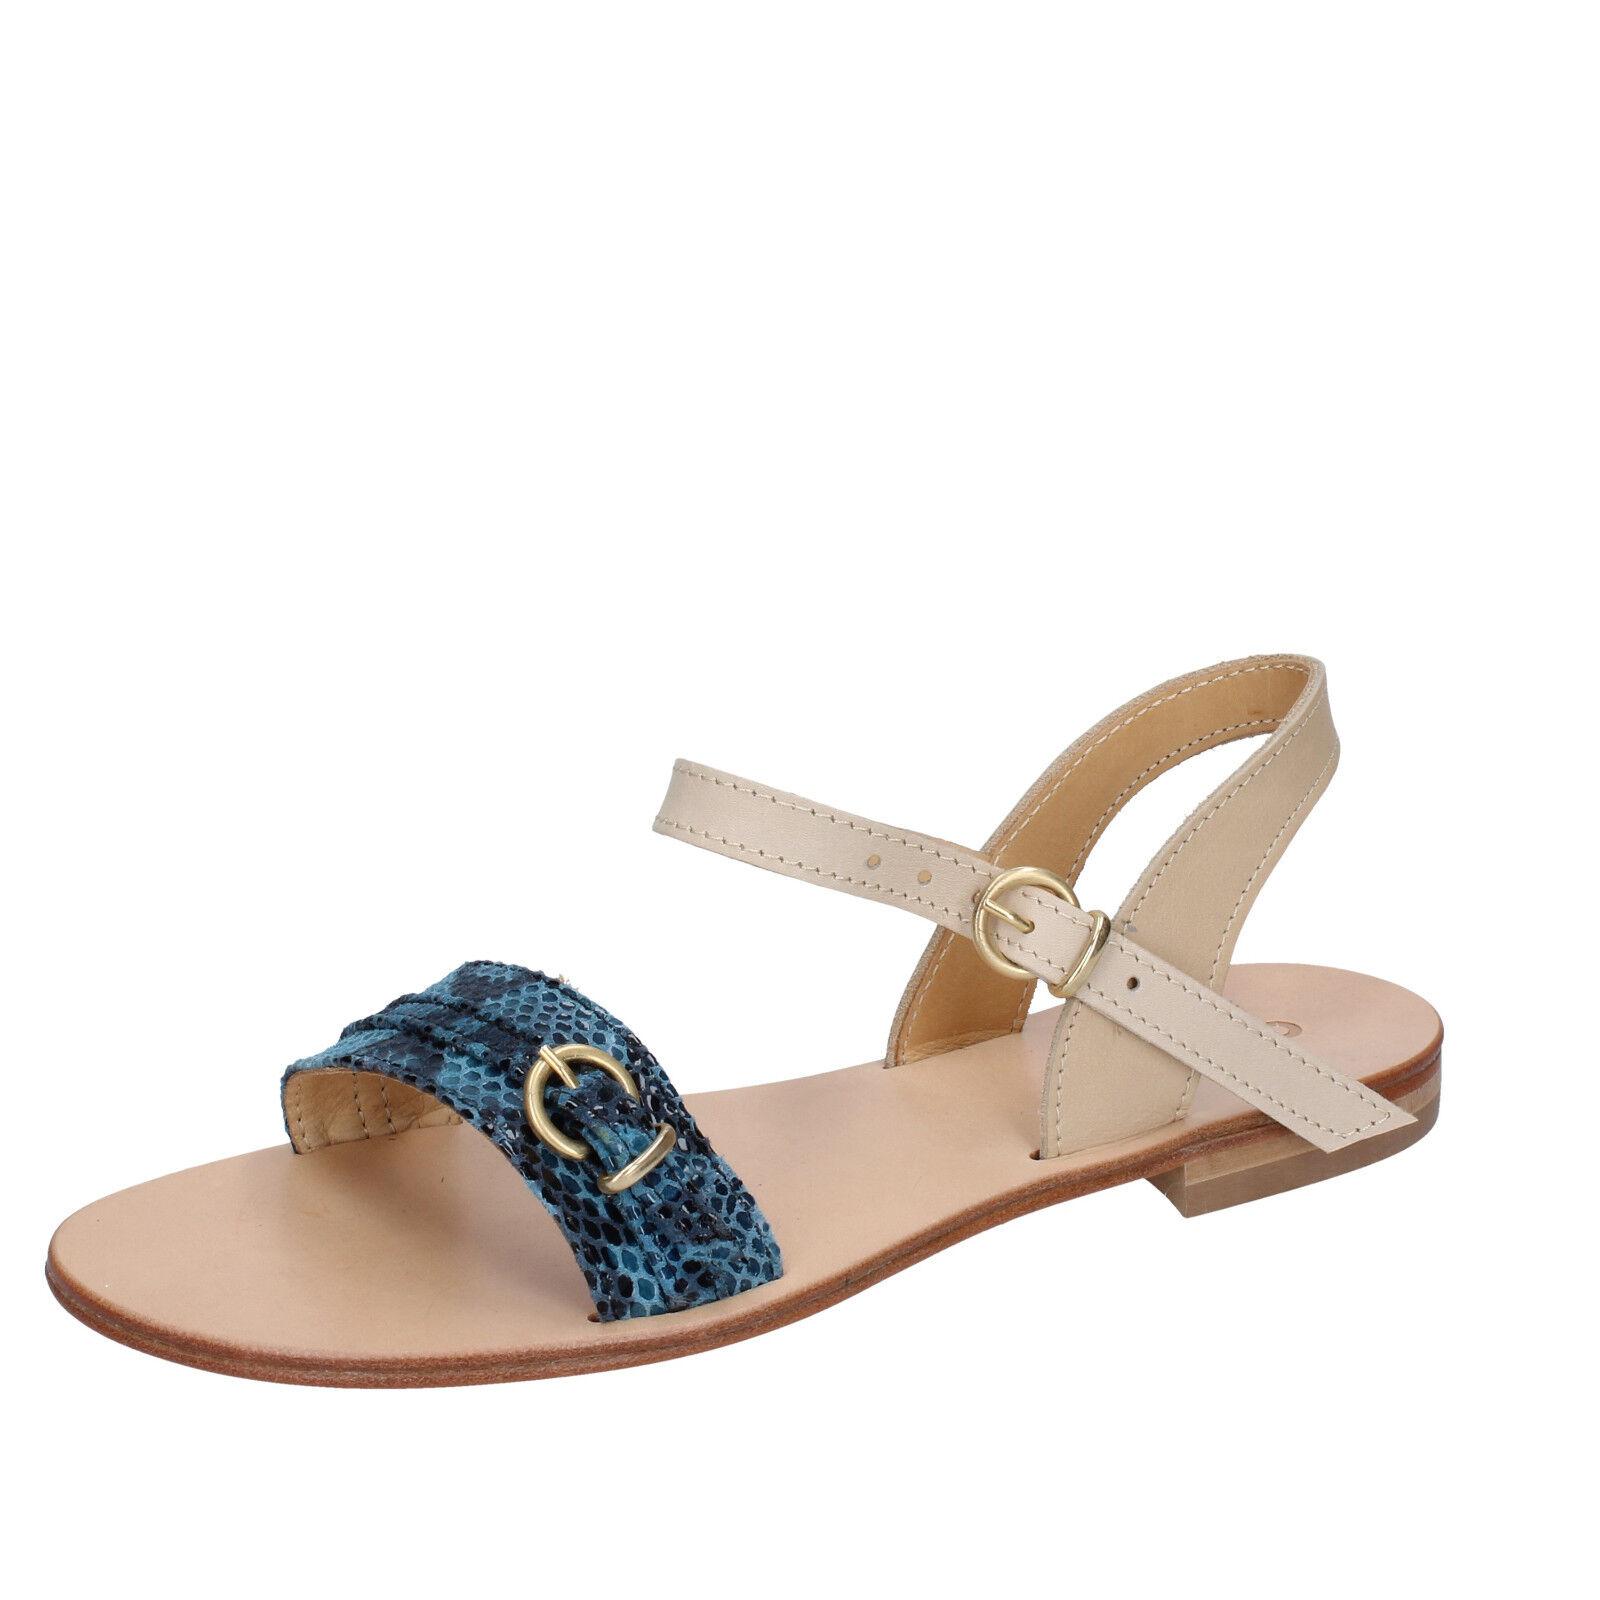 Scarpe BZ838 E donna CALPIERRE 40 sandali sandali sandali blu pelle BZ838 E Scarpe   e639cc